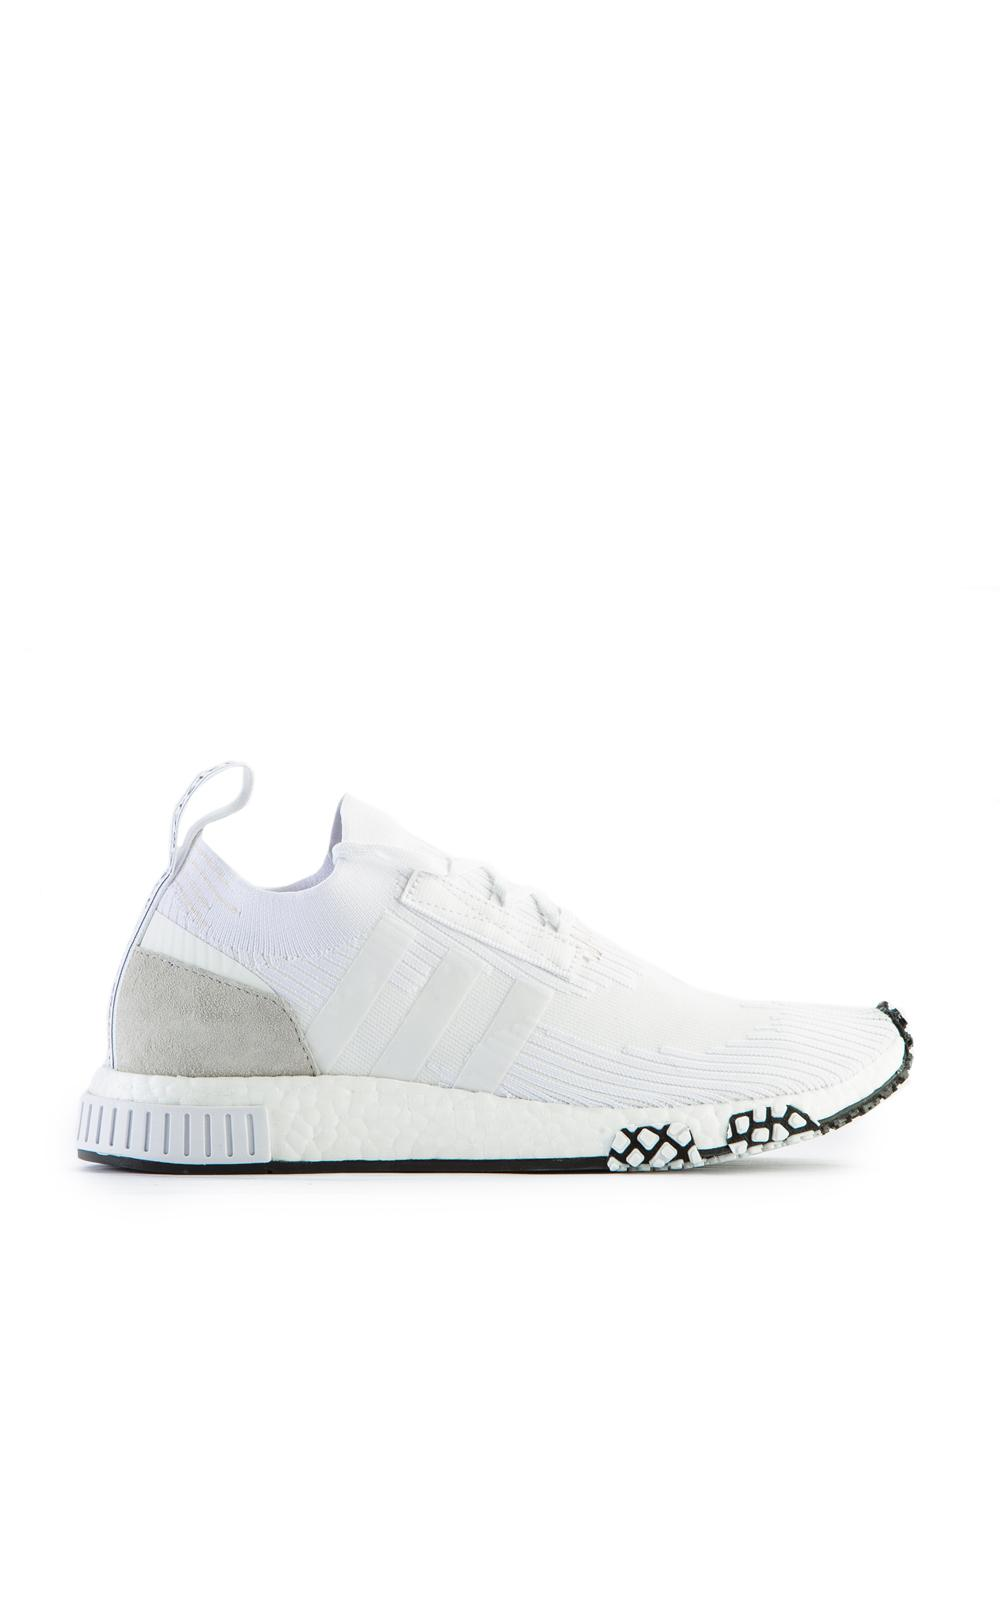 watch 50c8a db876 adidas Originals Nmd Racer Primeknit Triple White in White f